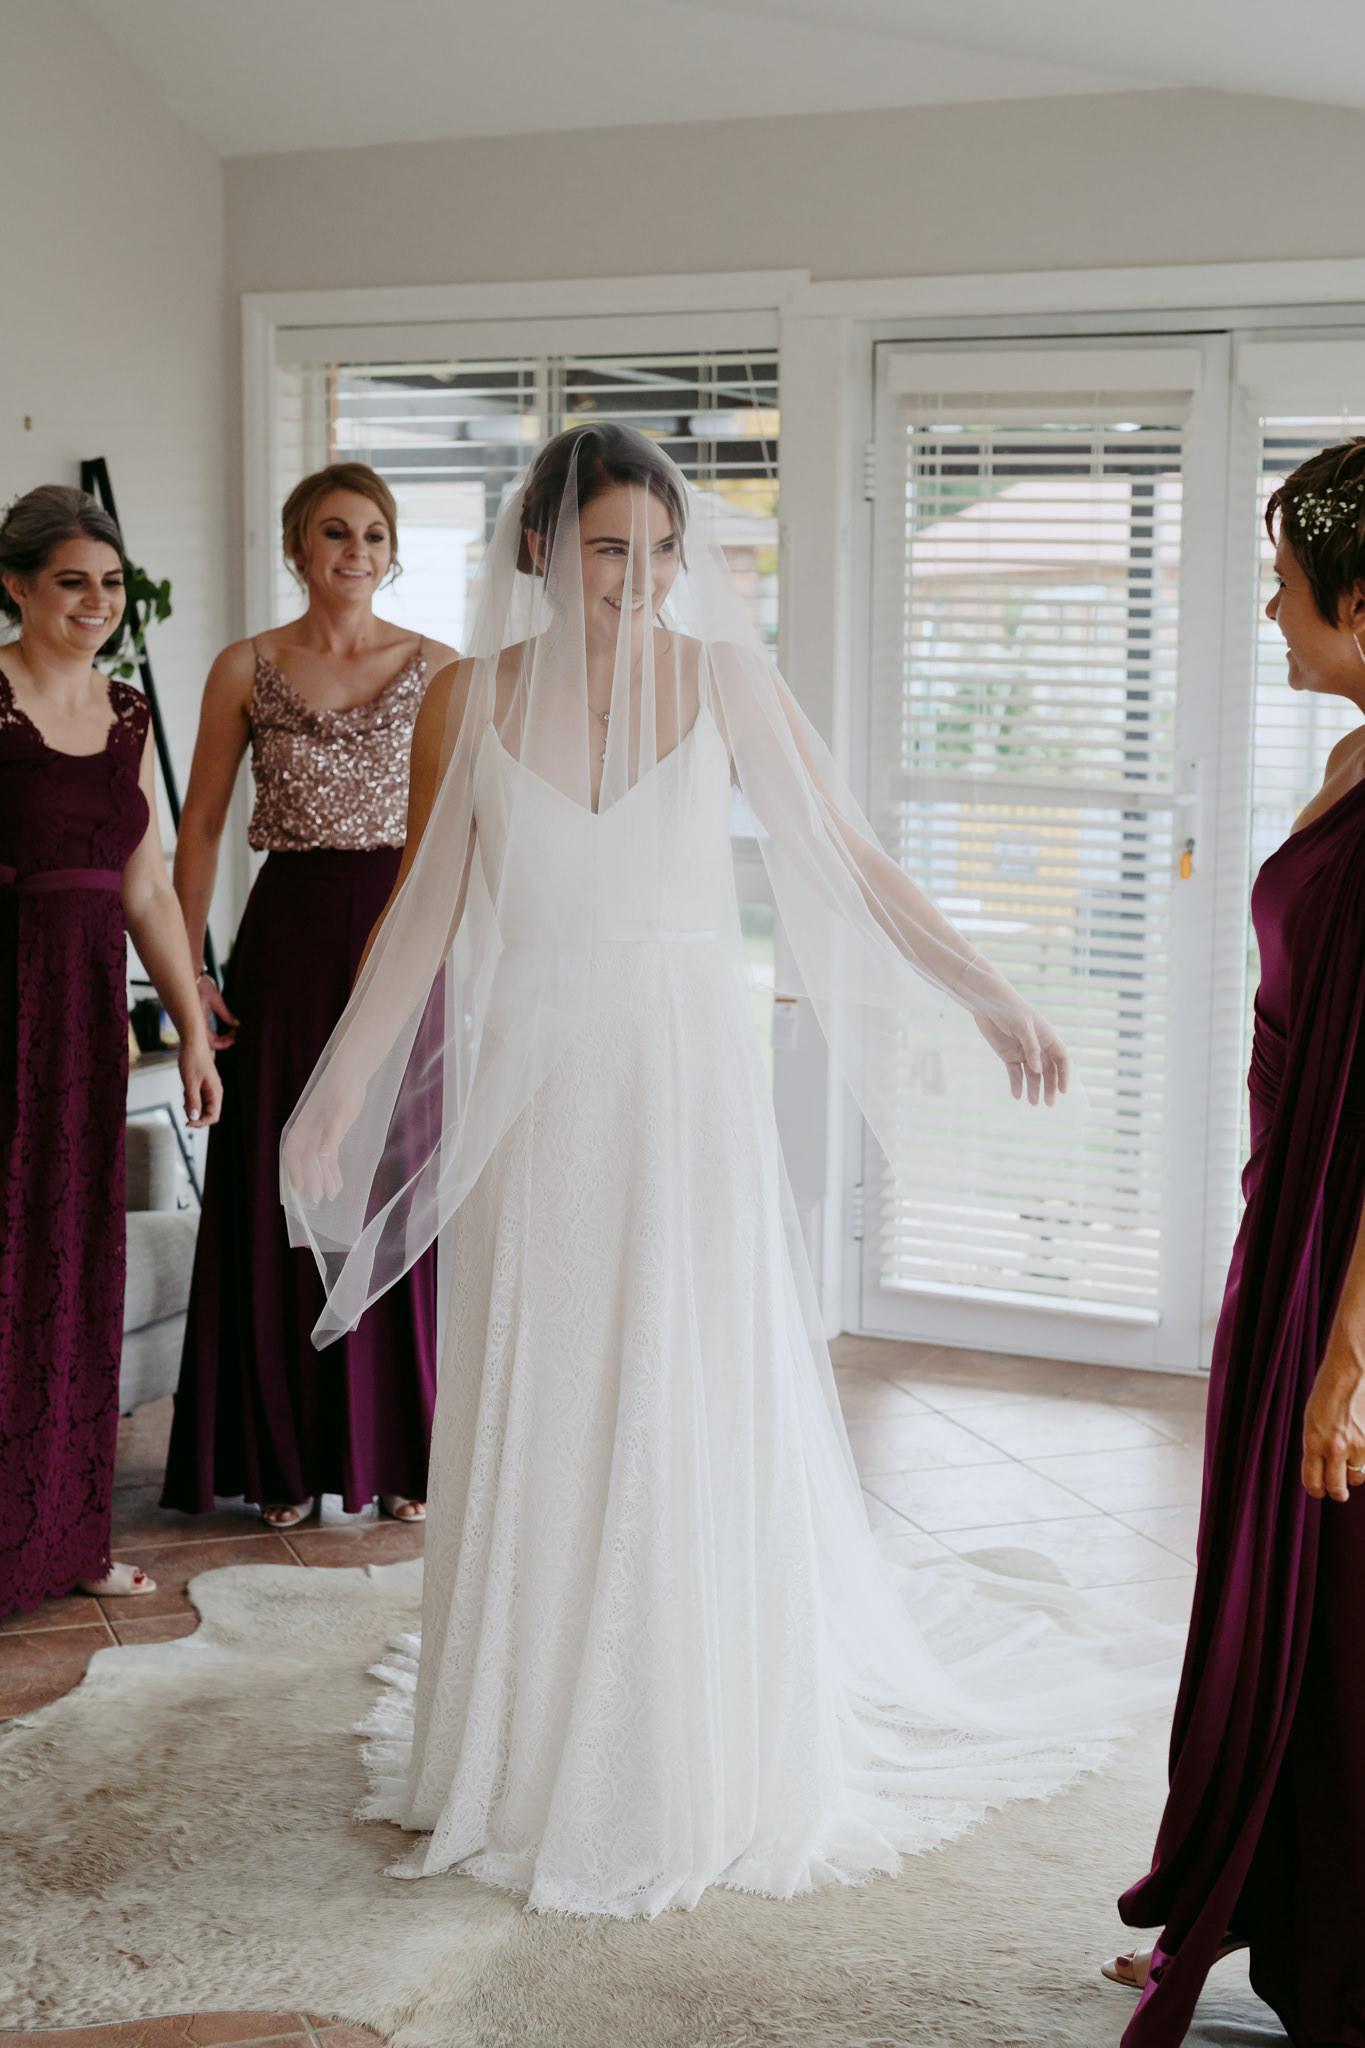 Erin Latimore Mudgee Canberra Wedding Photographer ROSEBANK GUESTHOUSE OLD THEATRE TONIC MILLTHORPE_097.JPG